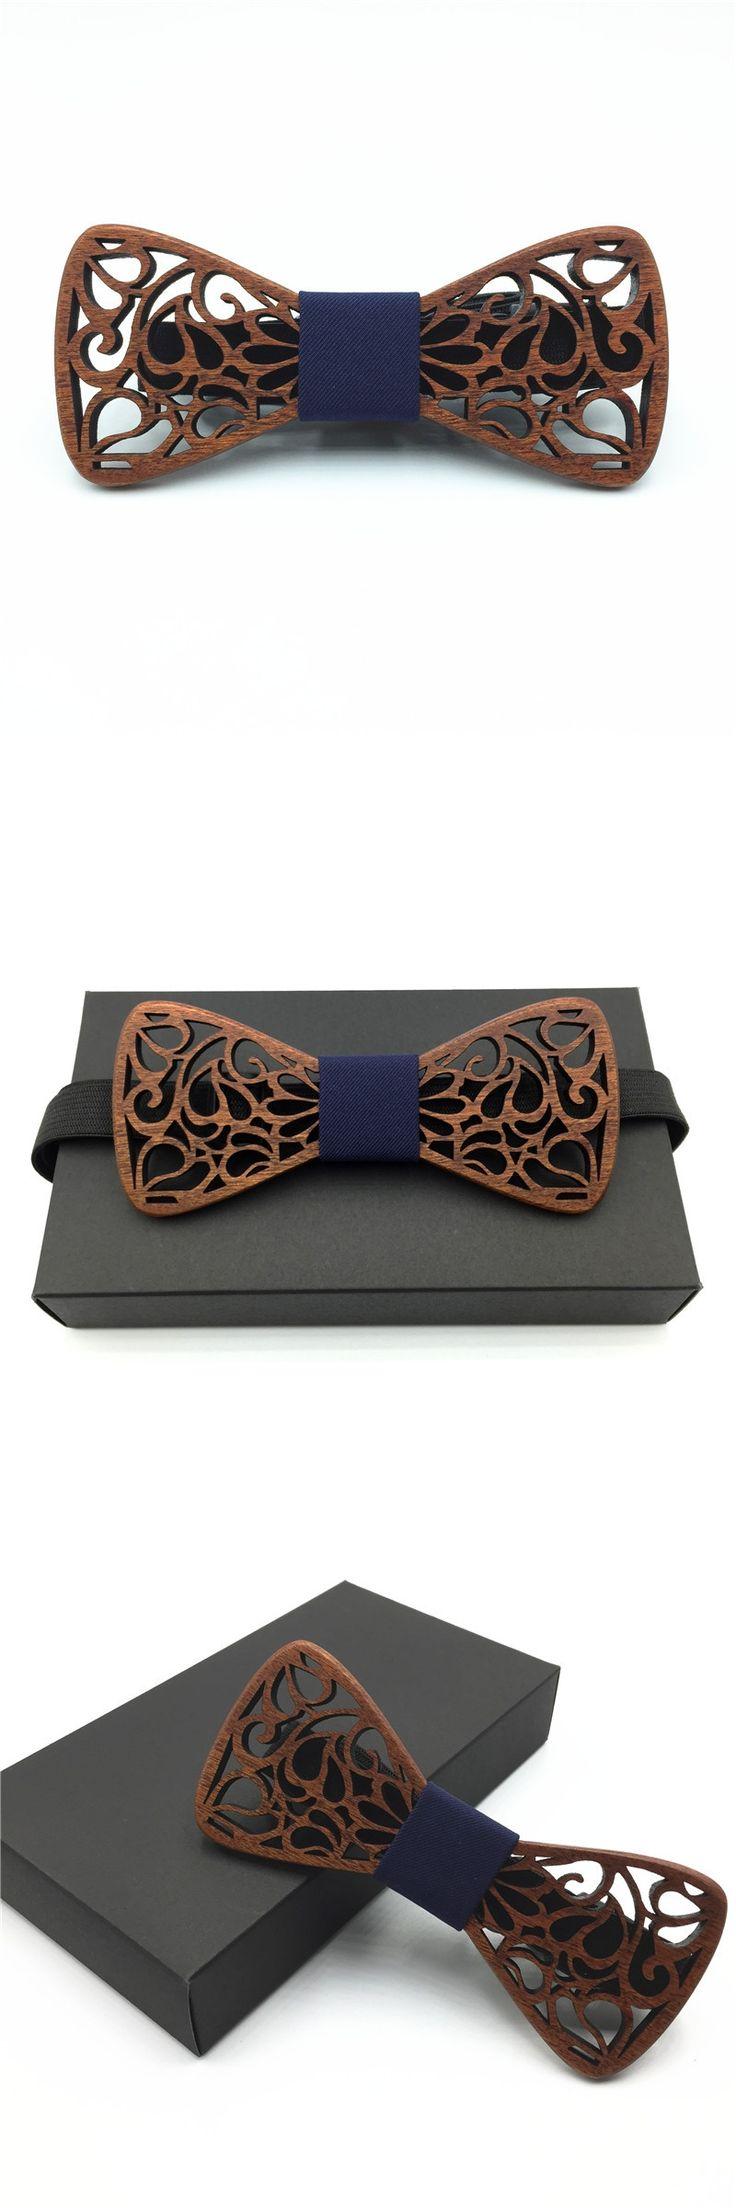 fake collar Wood Bow Tie Mens Wooden Bow Ties Gravatas Corbatas Business Butterfly Cravat Party Ties For Men Wood Ties